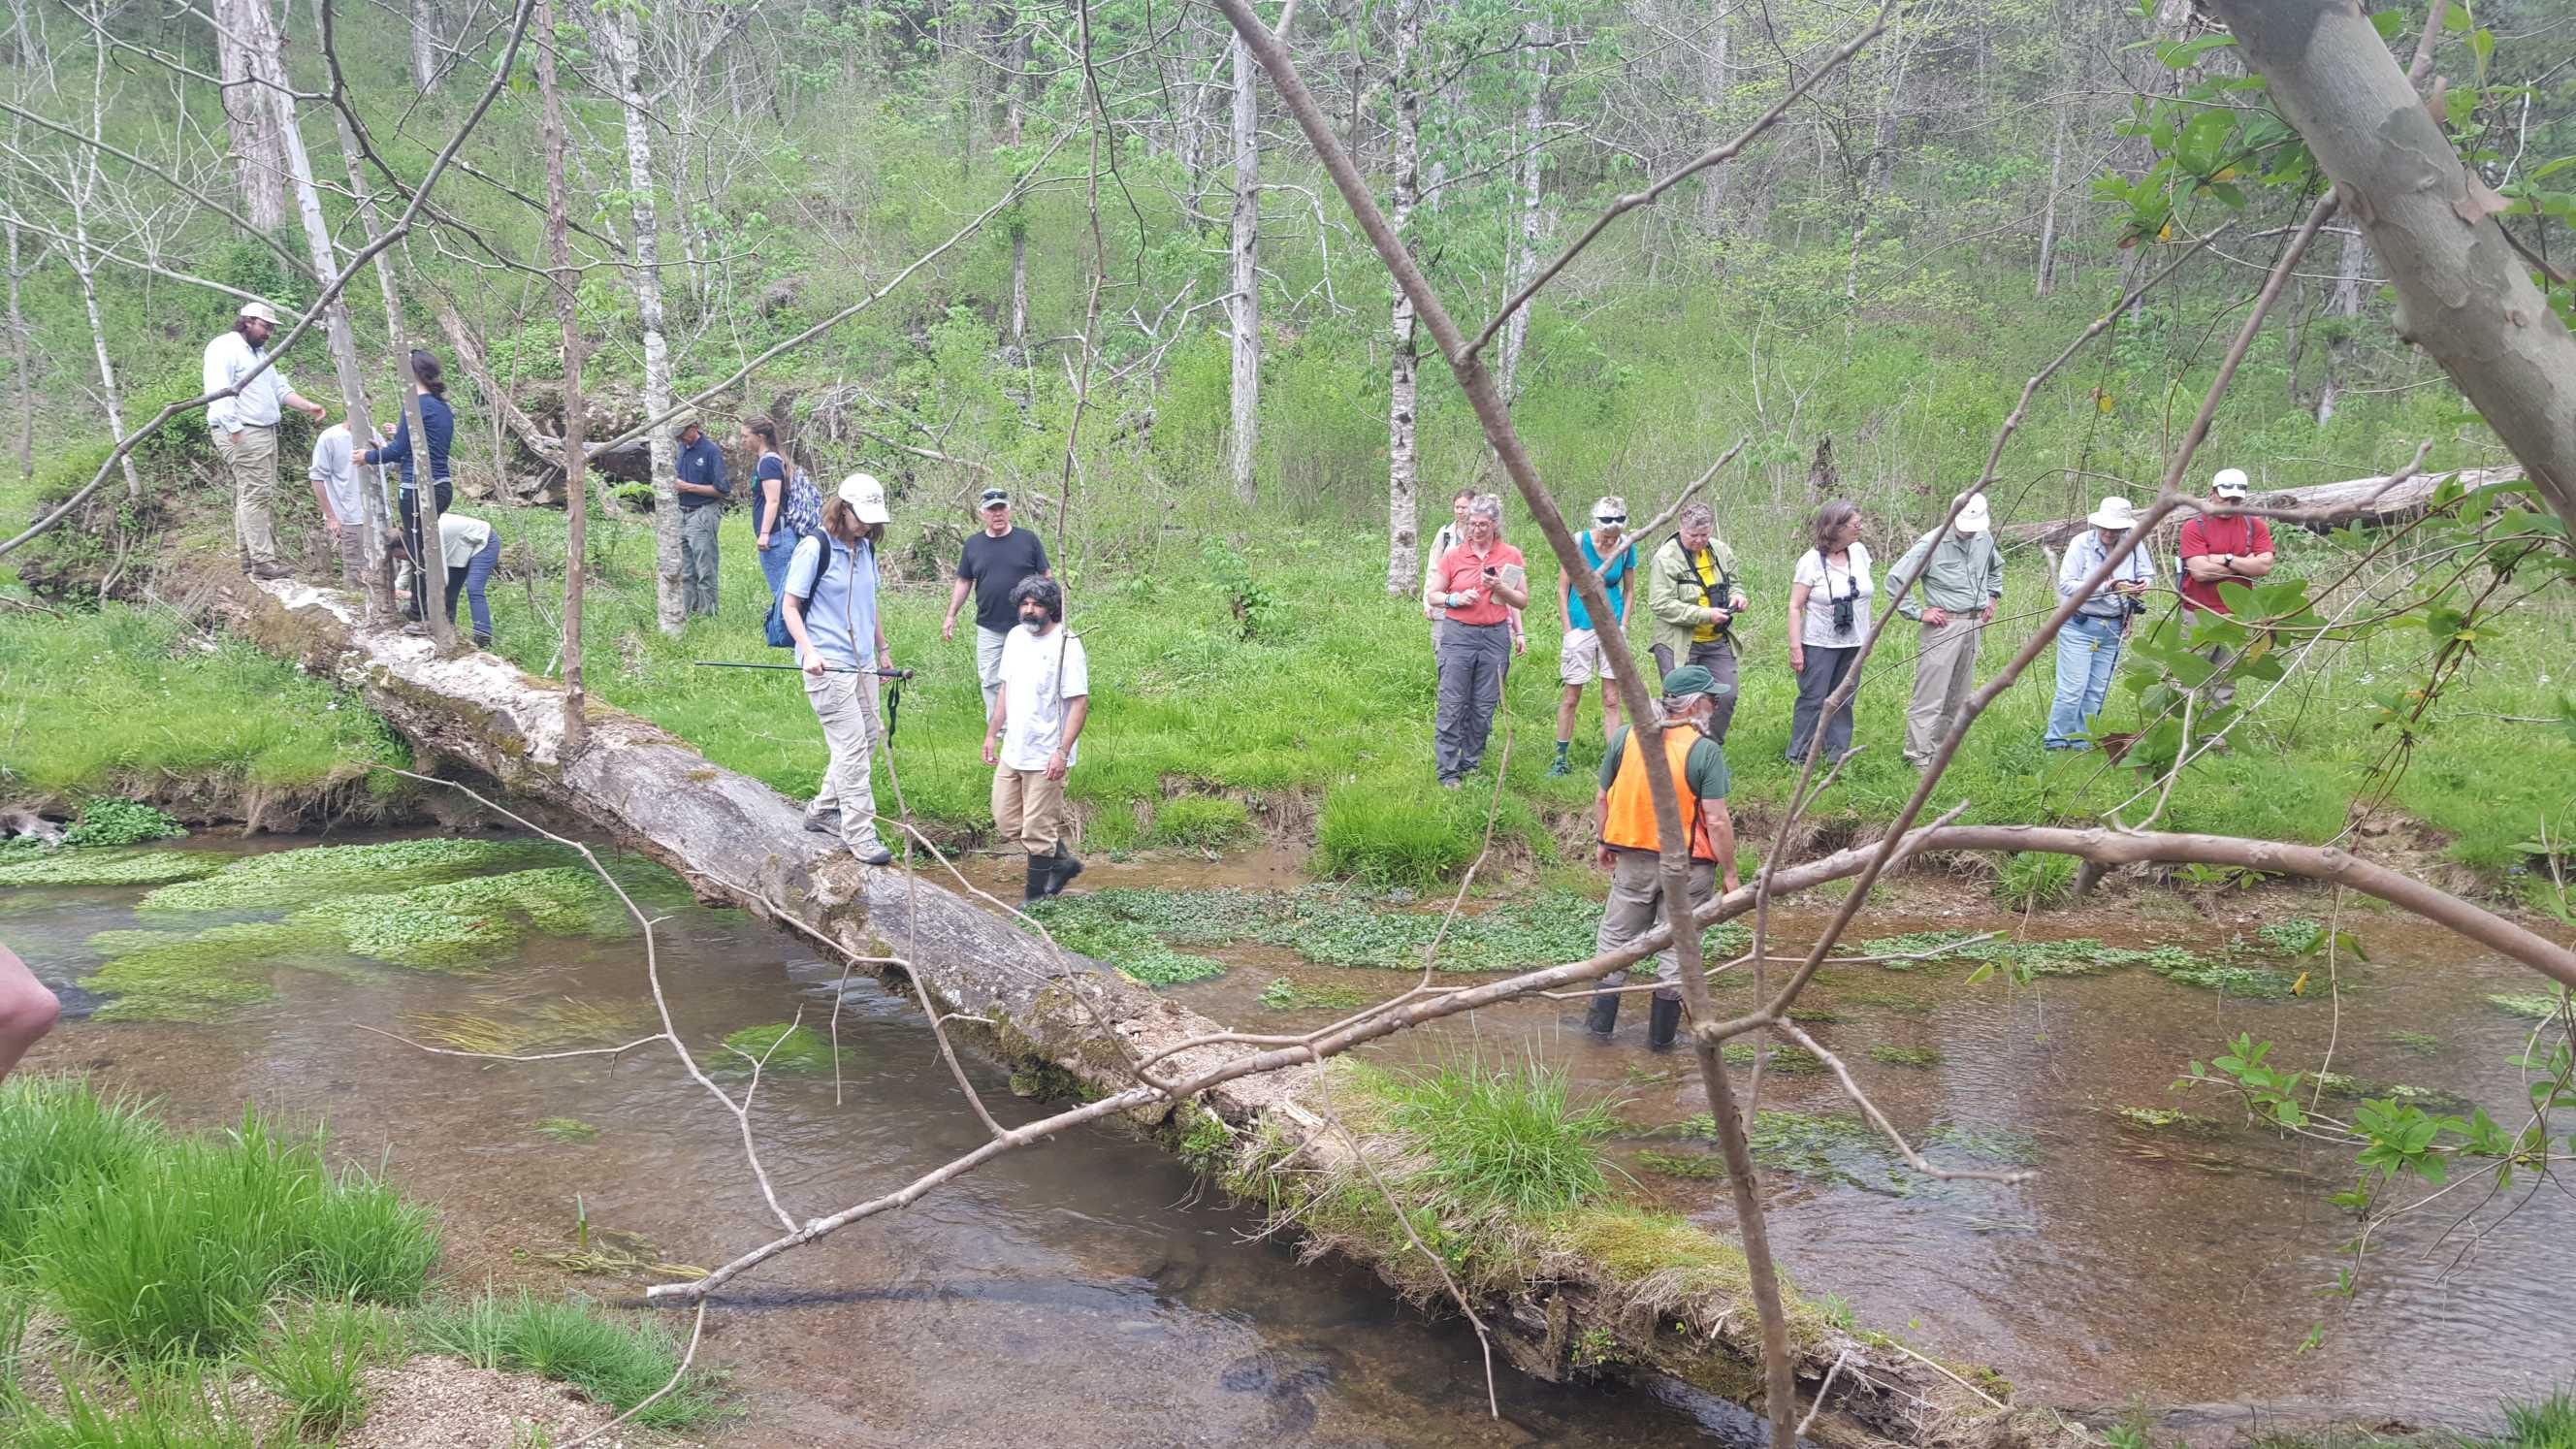 A Visit to The Cedars Natural Area Preserve Appreciation Days